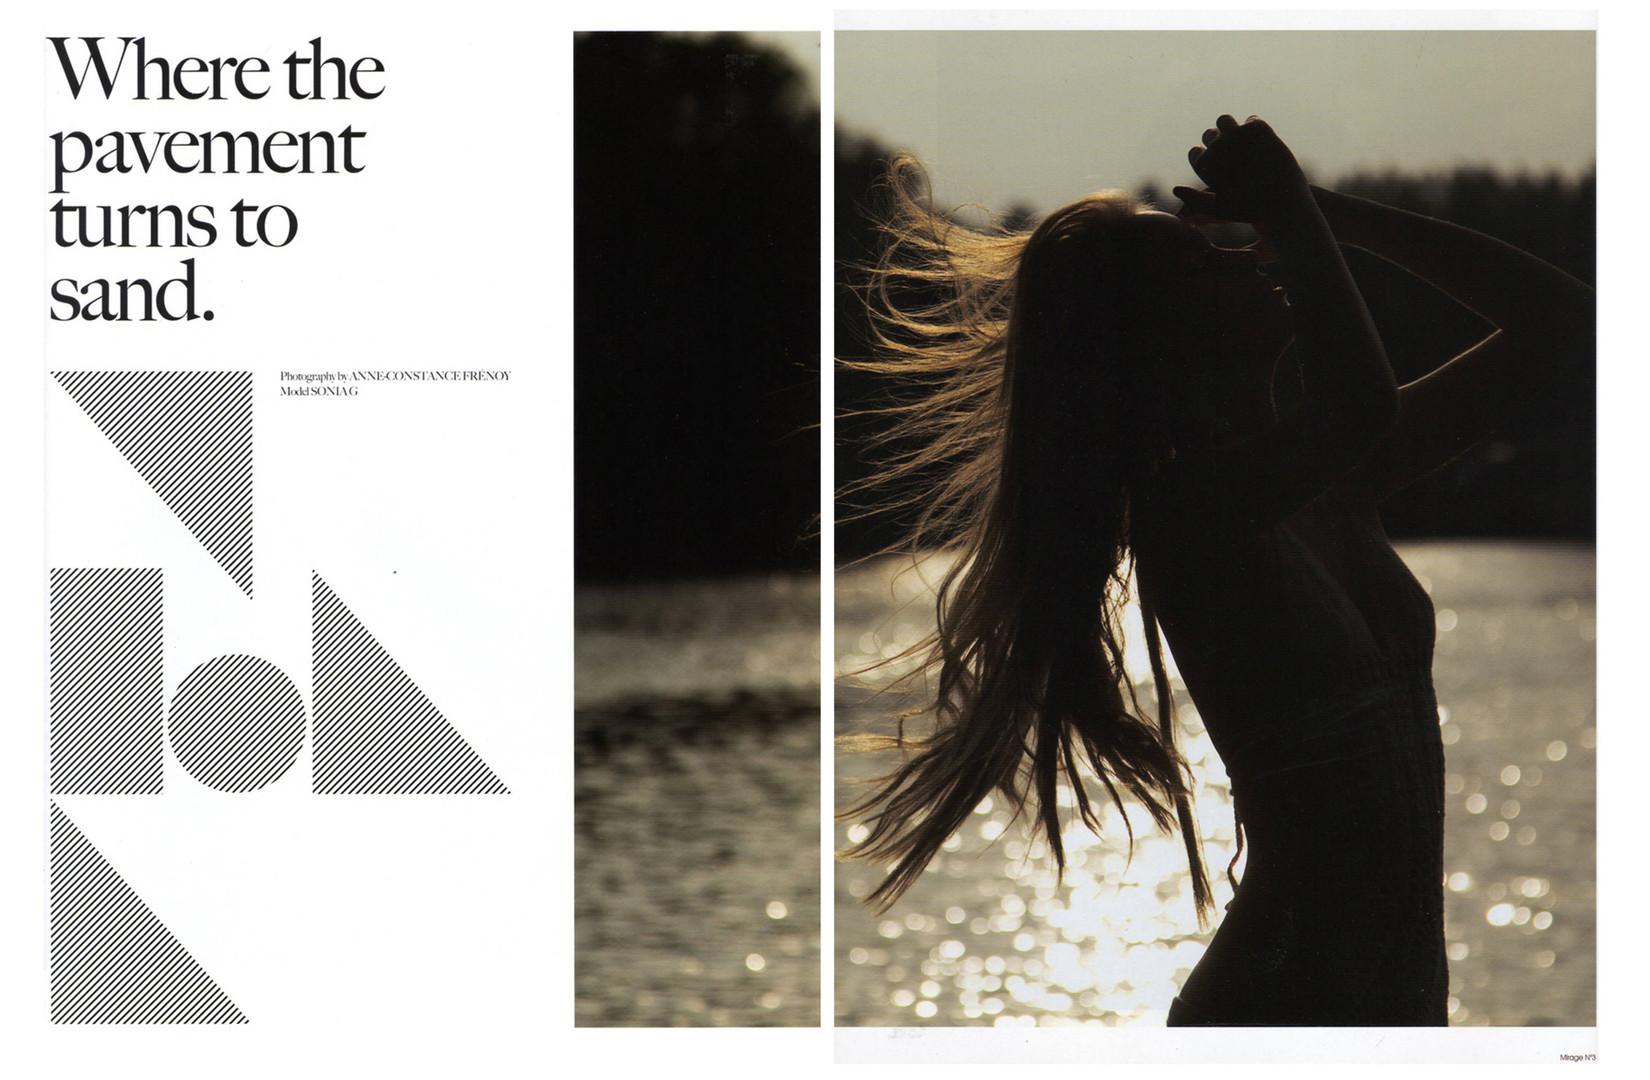 MIRAGE magazine. (International)